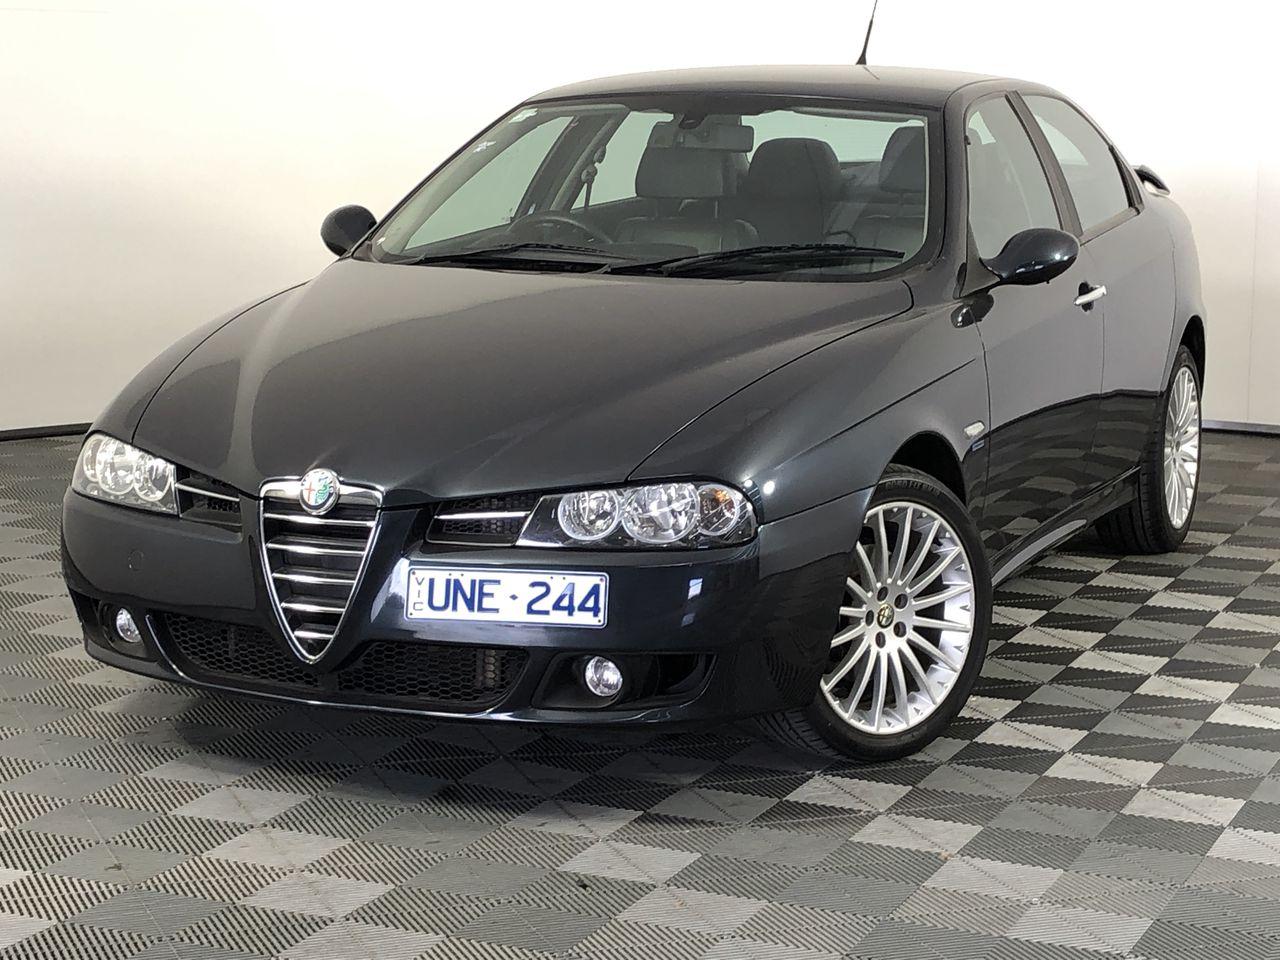 2007 Alfa Romeo 156 V6 24V Automatic Sedan